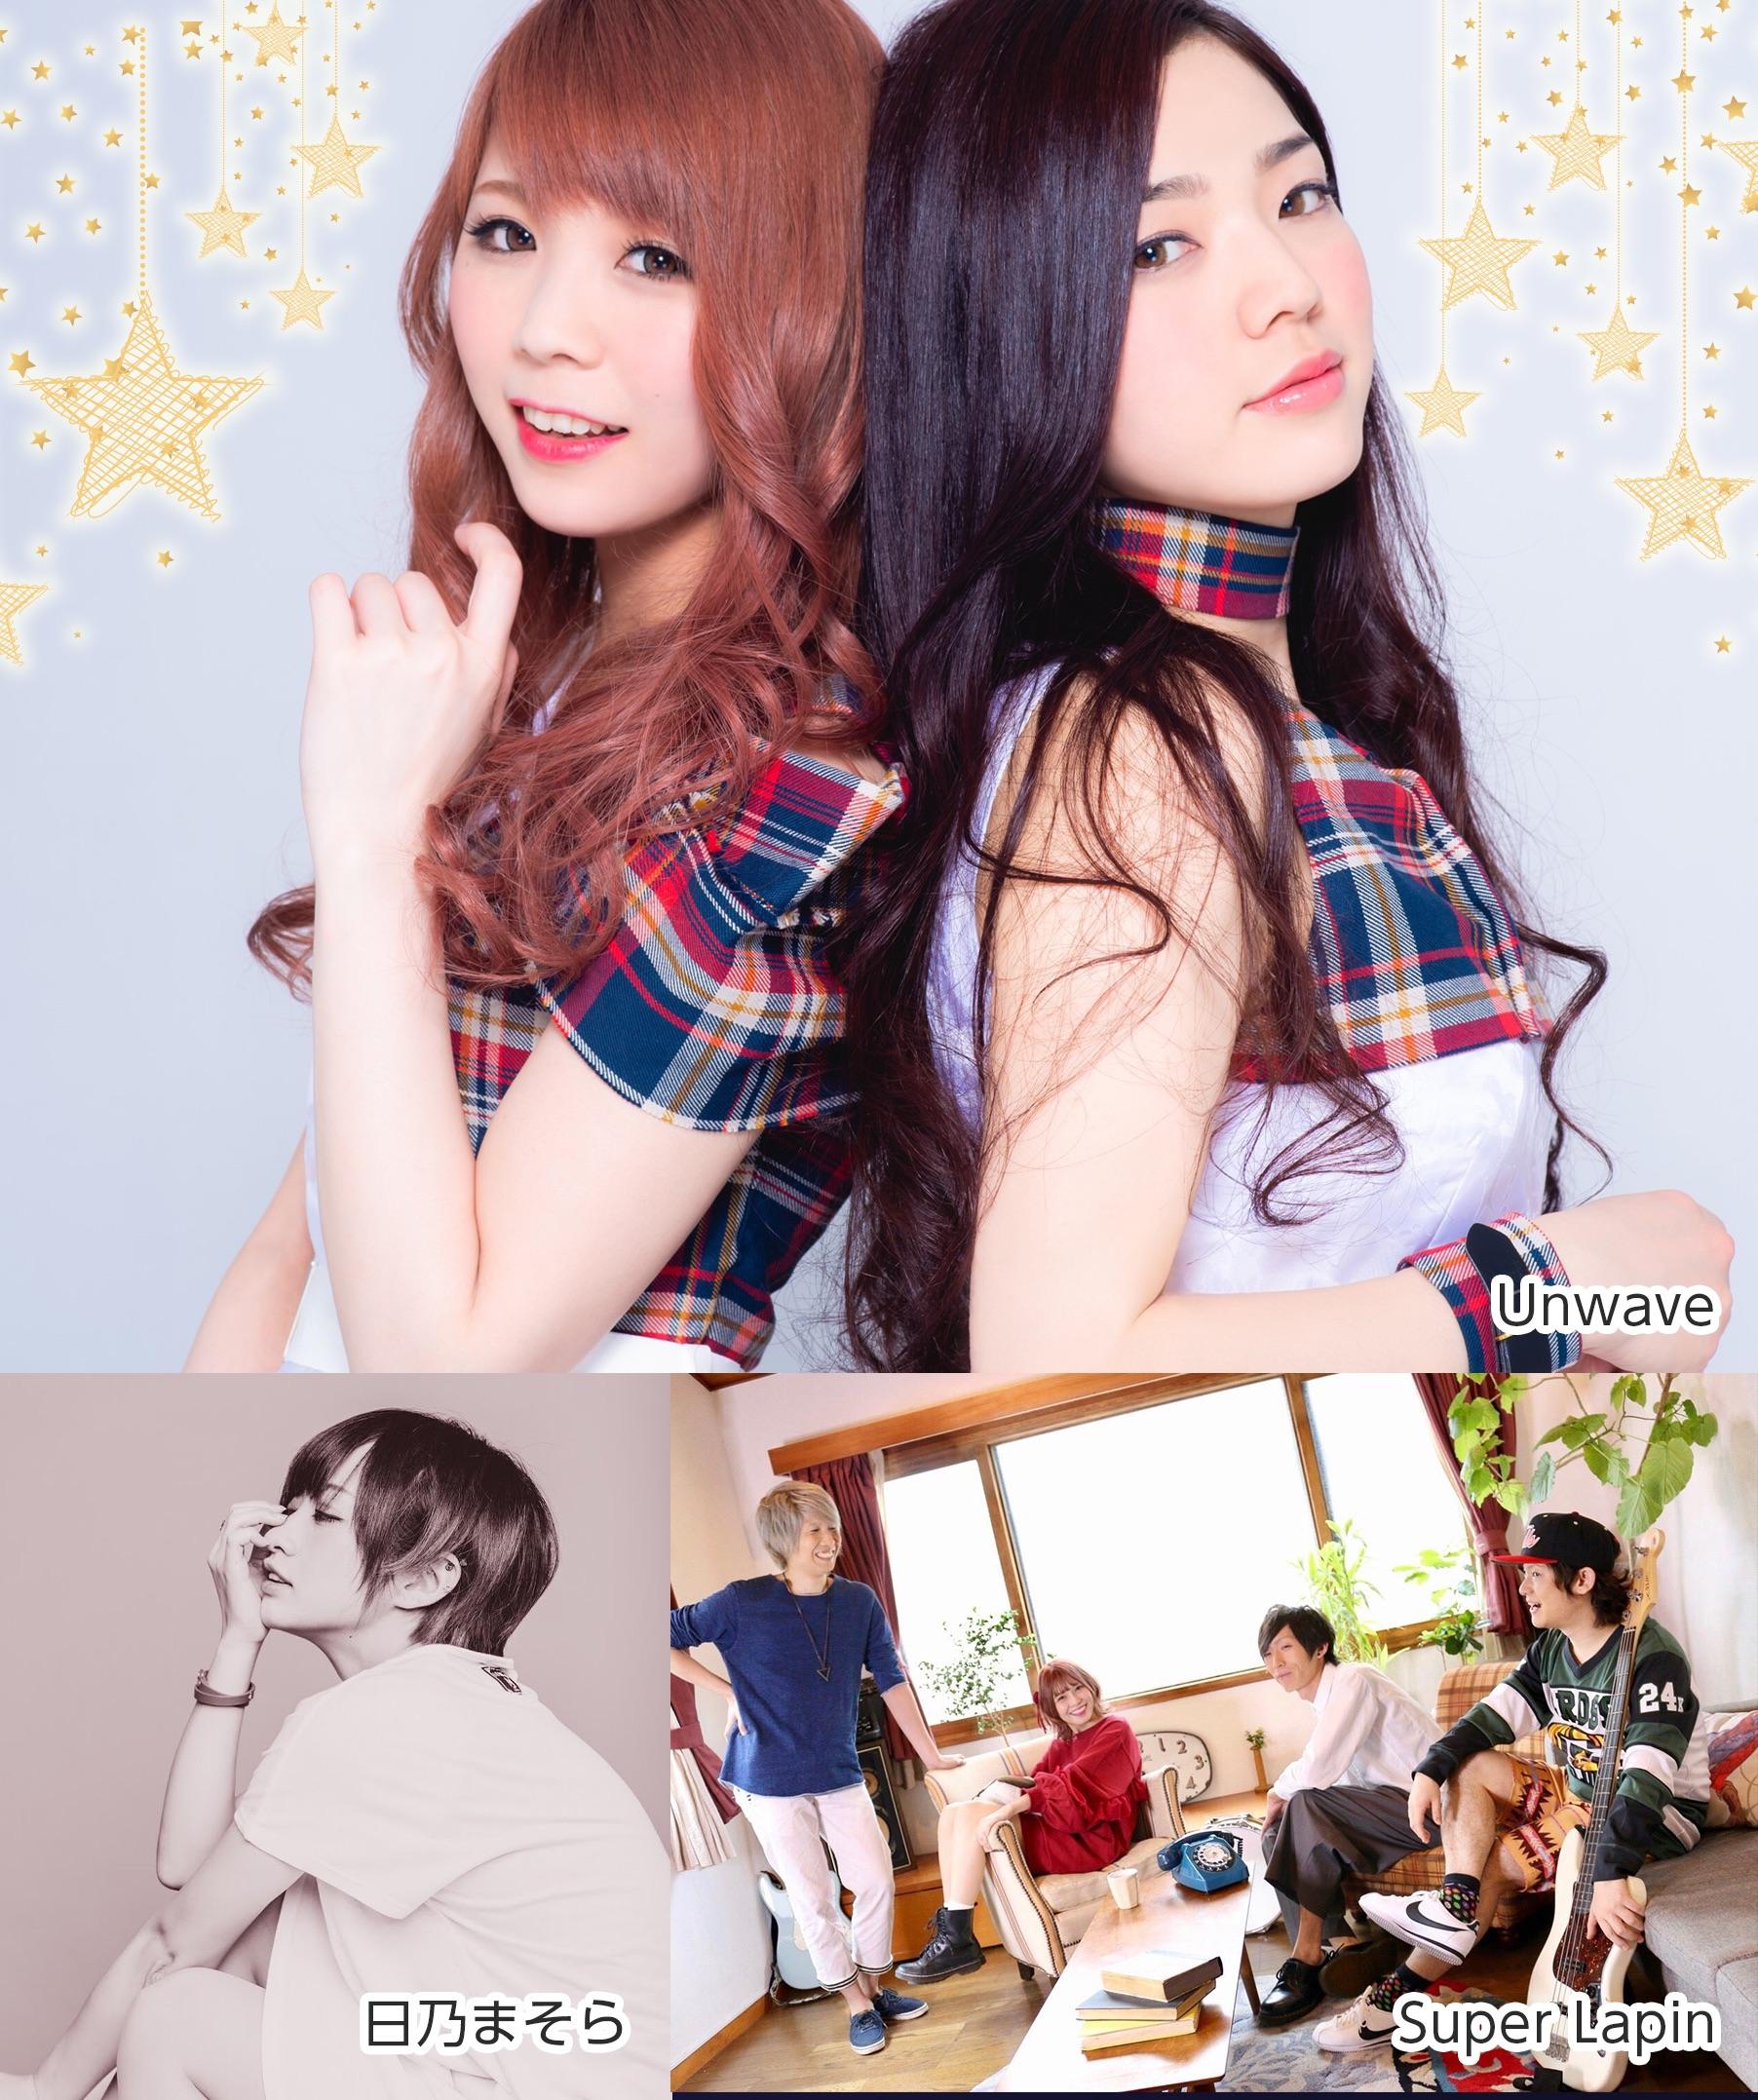 Unwave New album 「Combination!」Release event 【 DREAMING MACTH 】